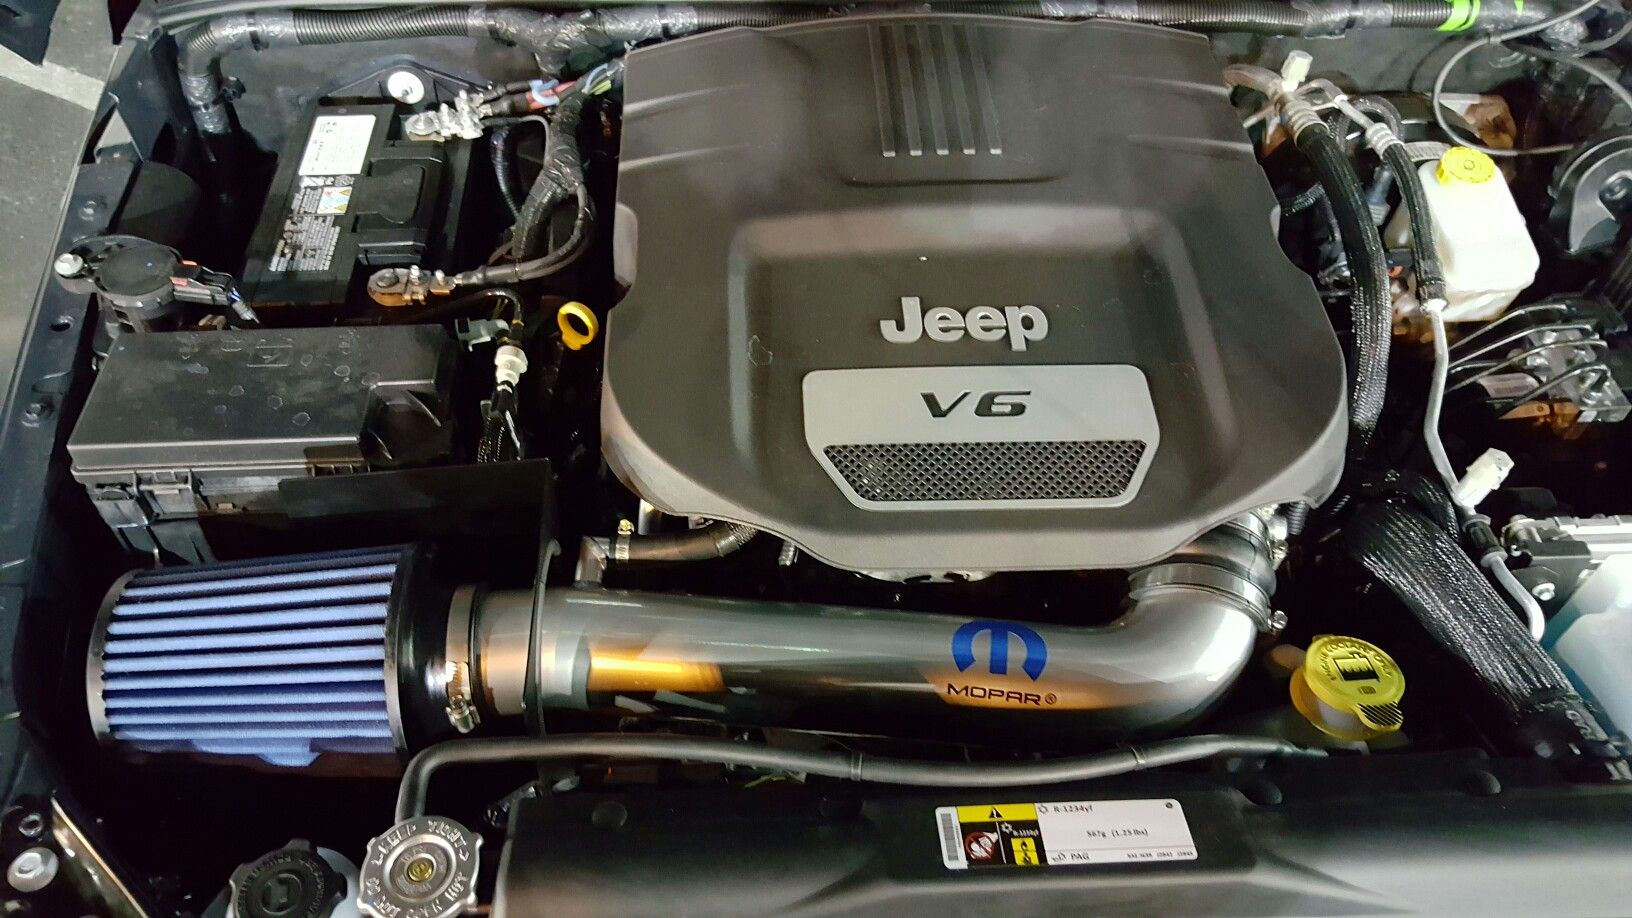 Mopar Cold air intake on Wrangler 3.6L Cold air intake